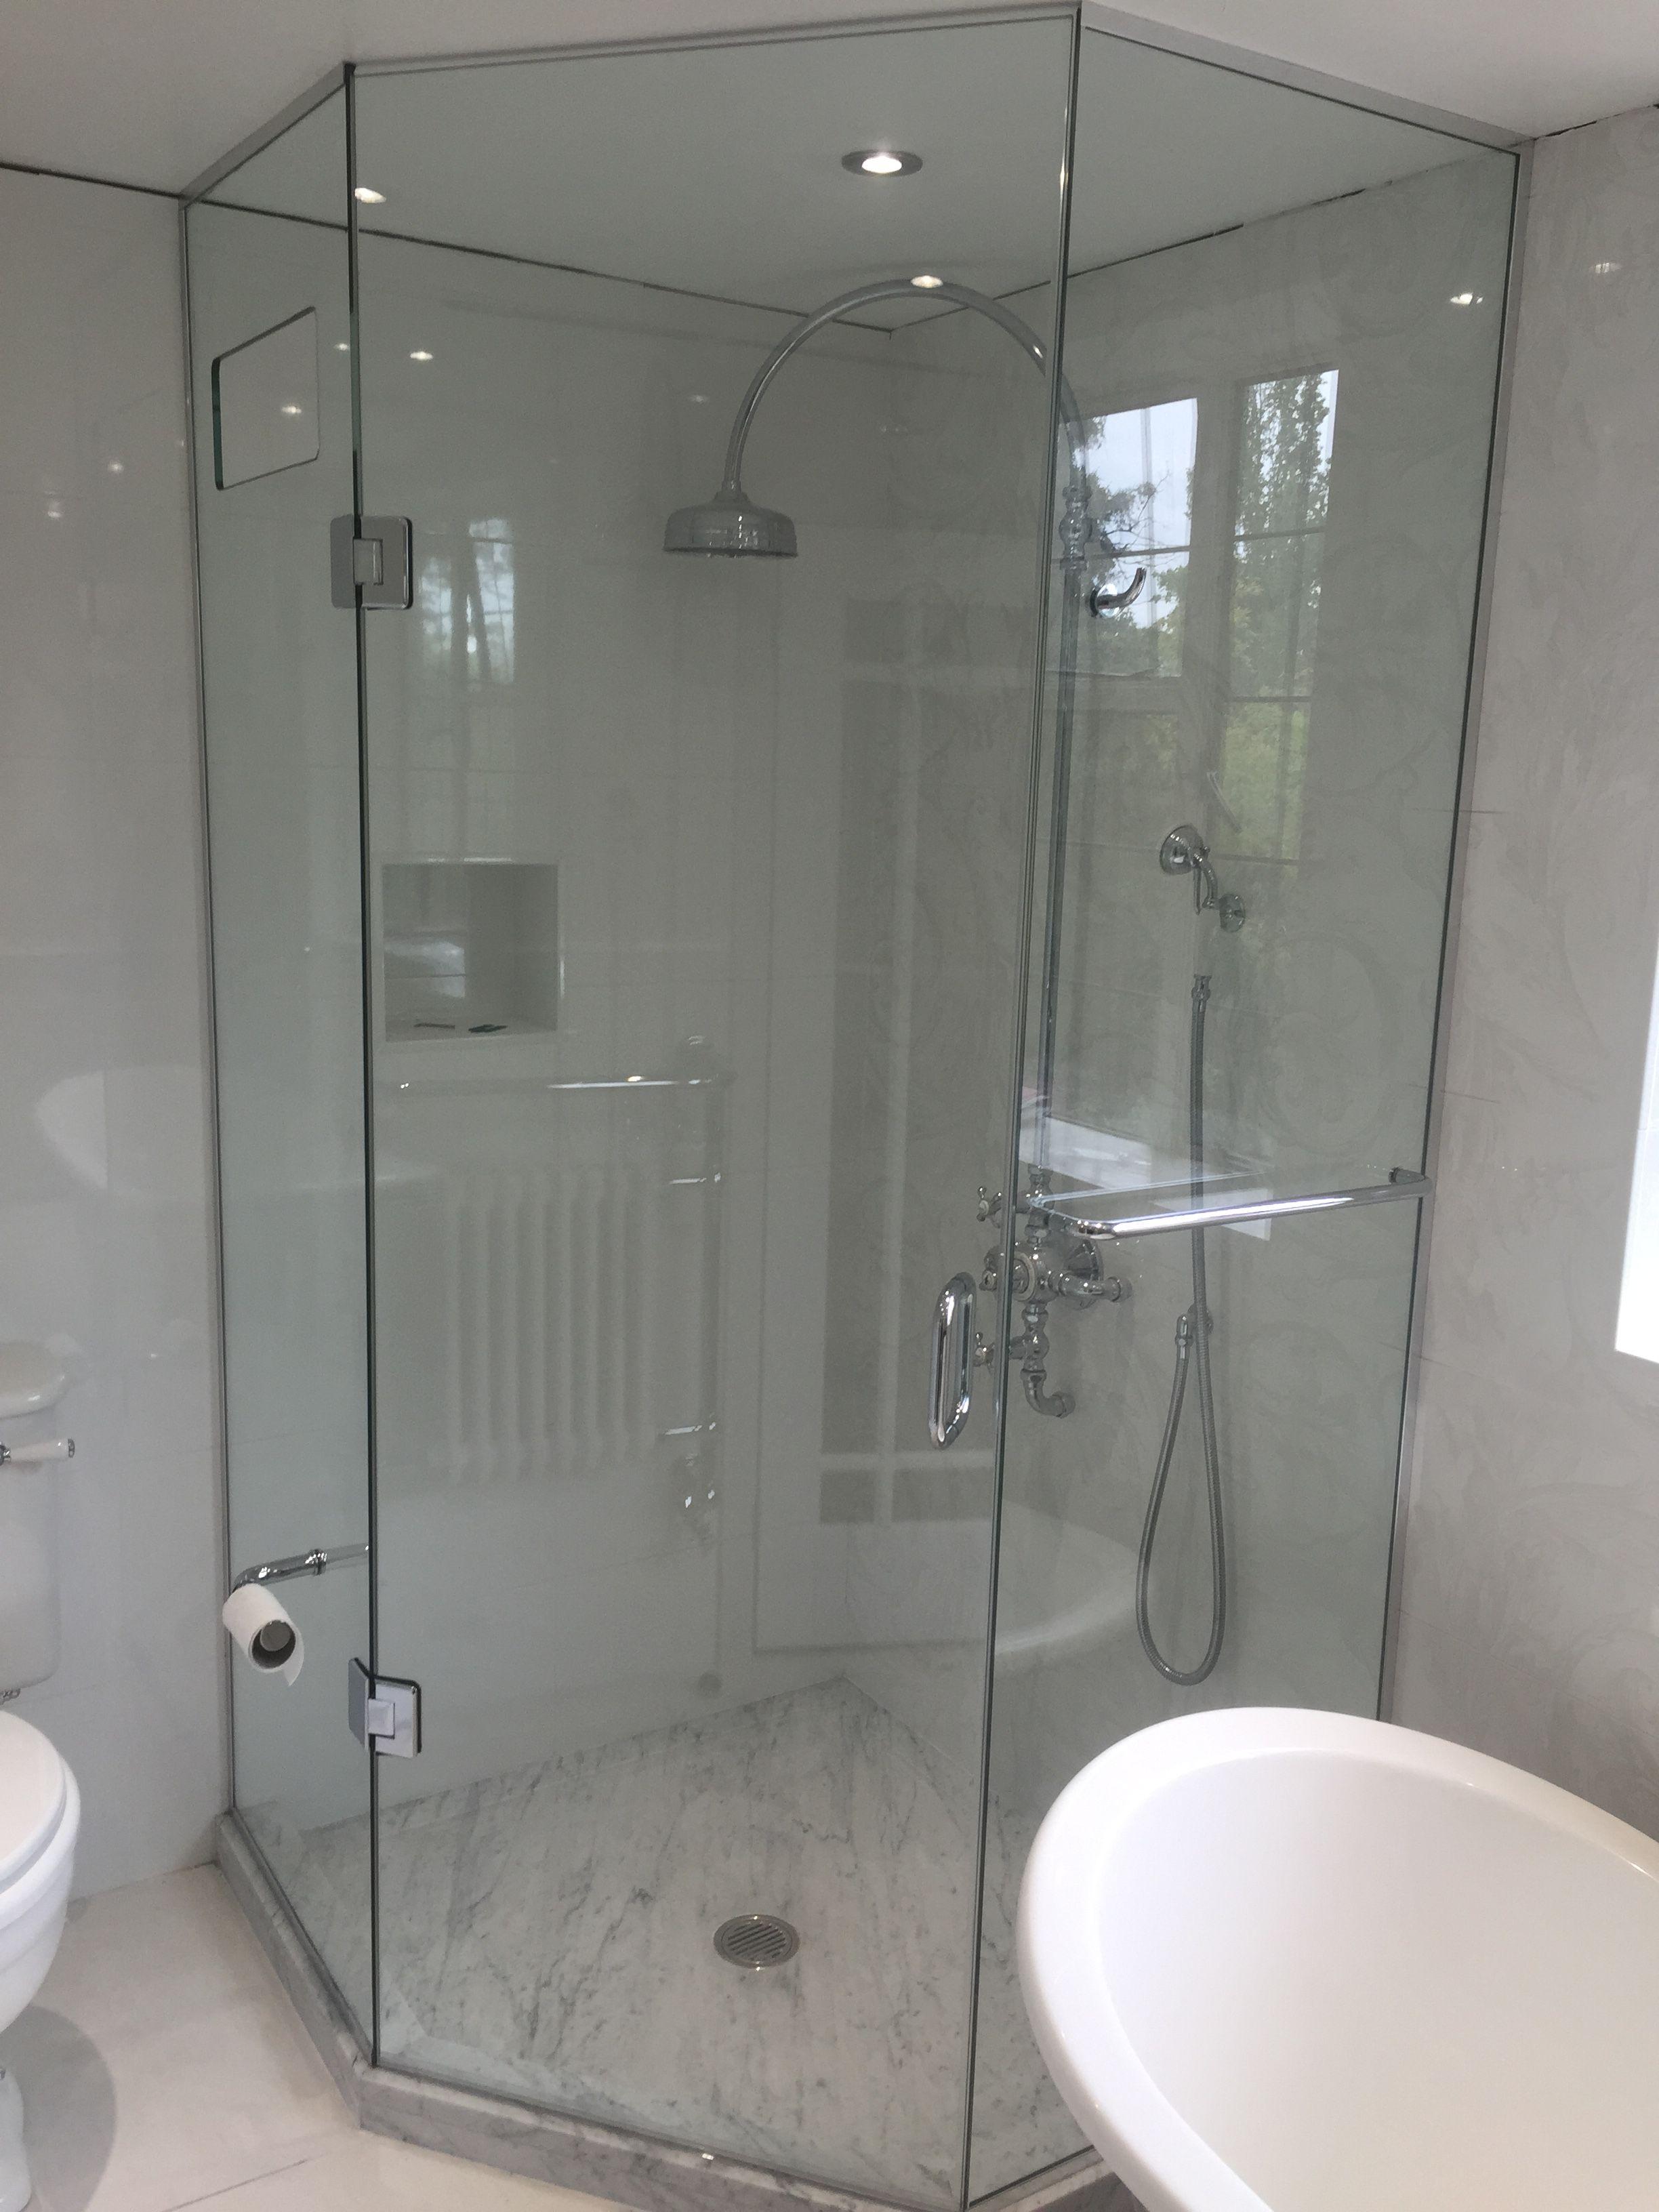 Frameless Pentagonal Shower Enclosure Full Height Floor To Ceiling In Low Iron Glass With Thr House Bathroom Designs Bathroom Design Small Bathroom Interior